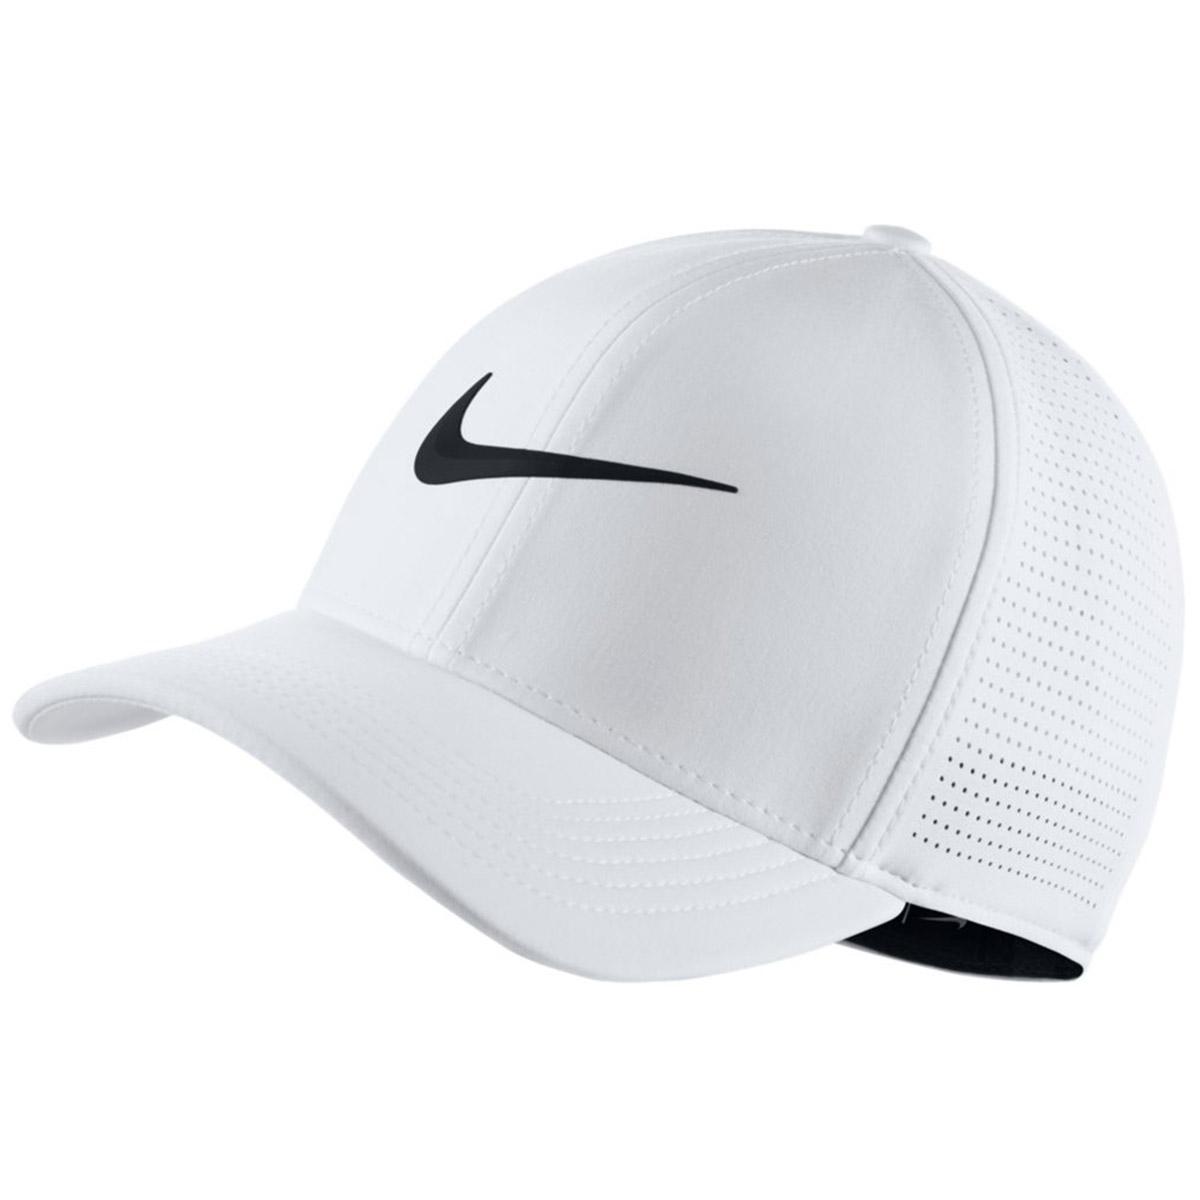 hot sale online a94bd 04c0b Nike Cap Aerobill Classc 99 S9 ...